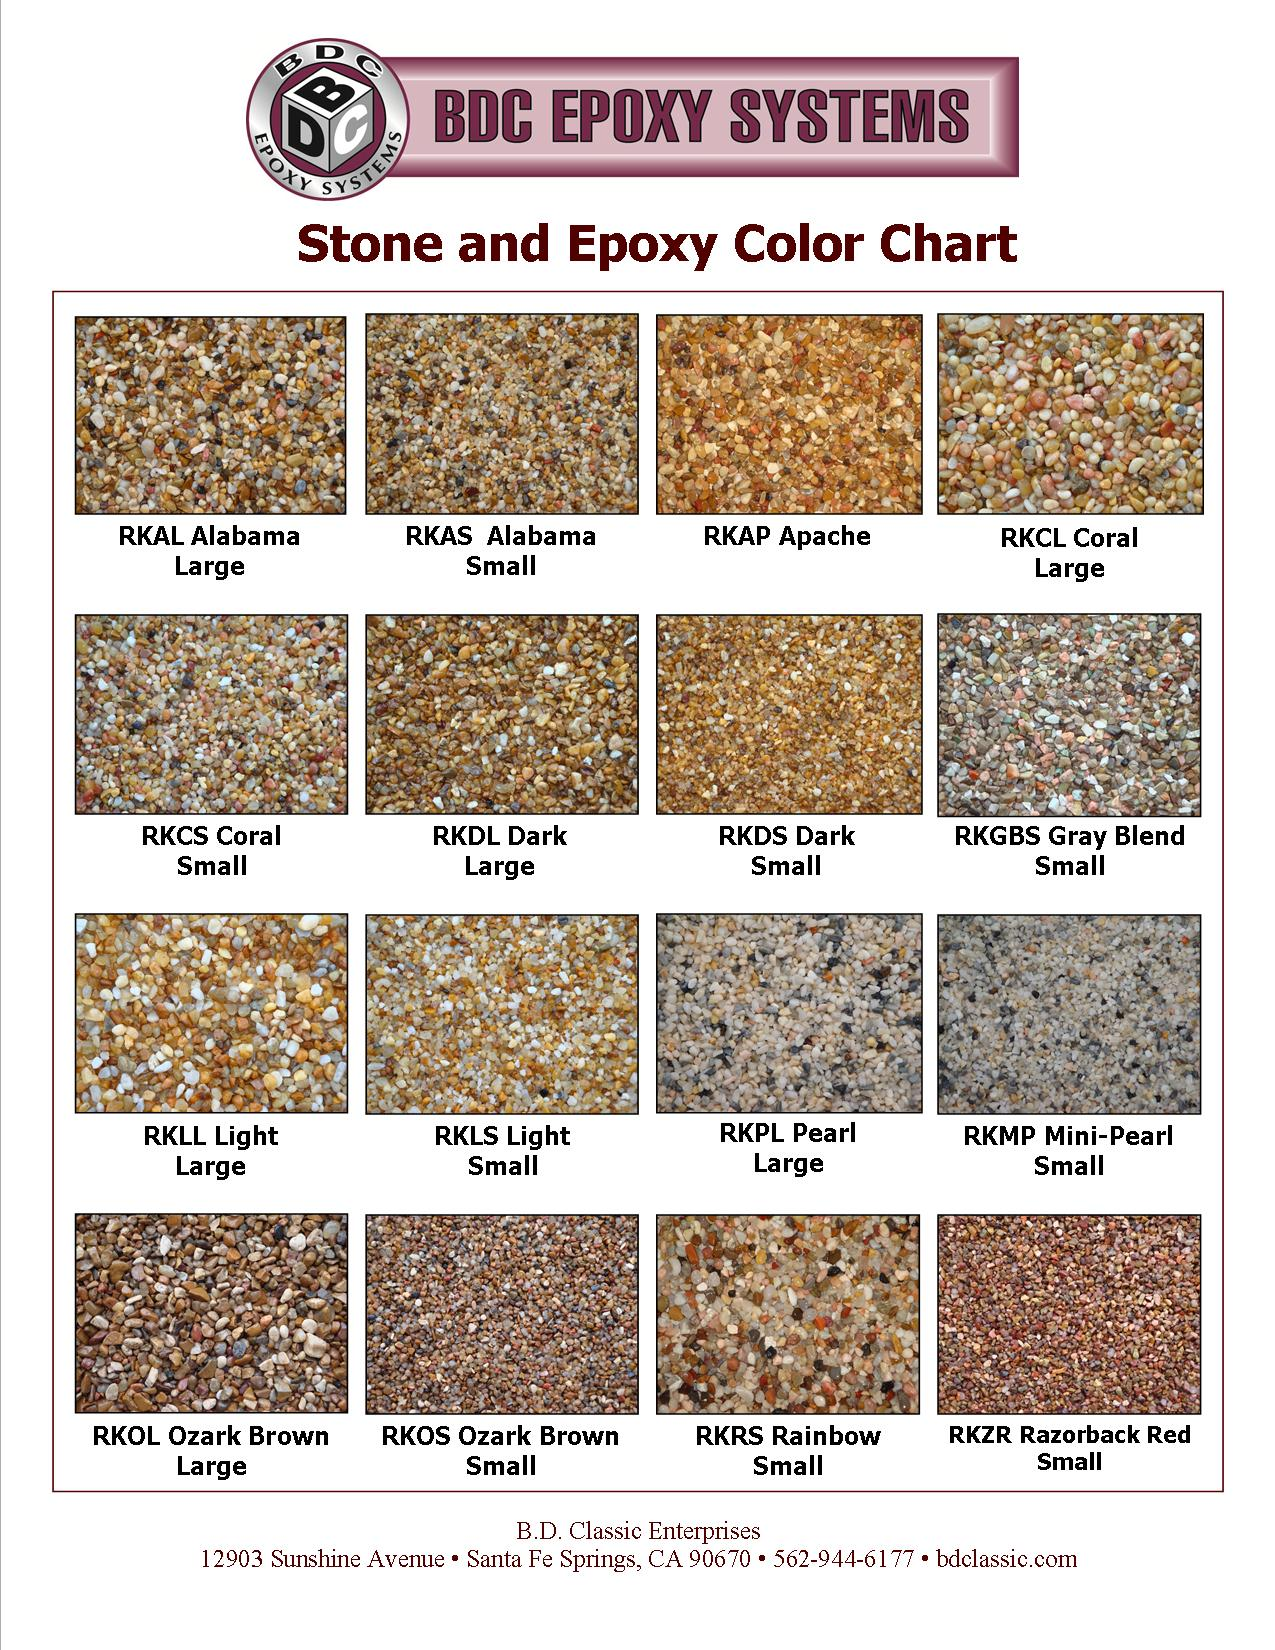 Pebble Stone Bathroom Floor Rukinet Com  Epoxy Flooring In Bathroom. Pebble Epoxy Flooring   Flooring